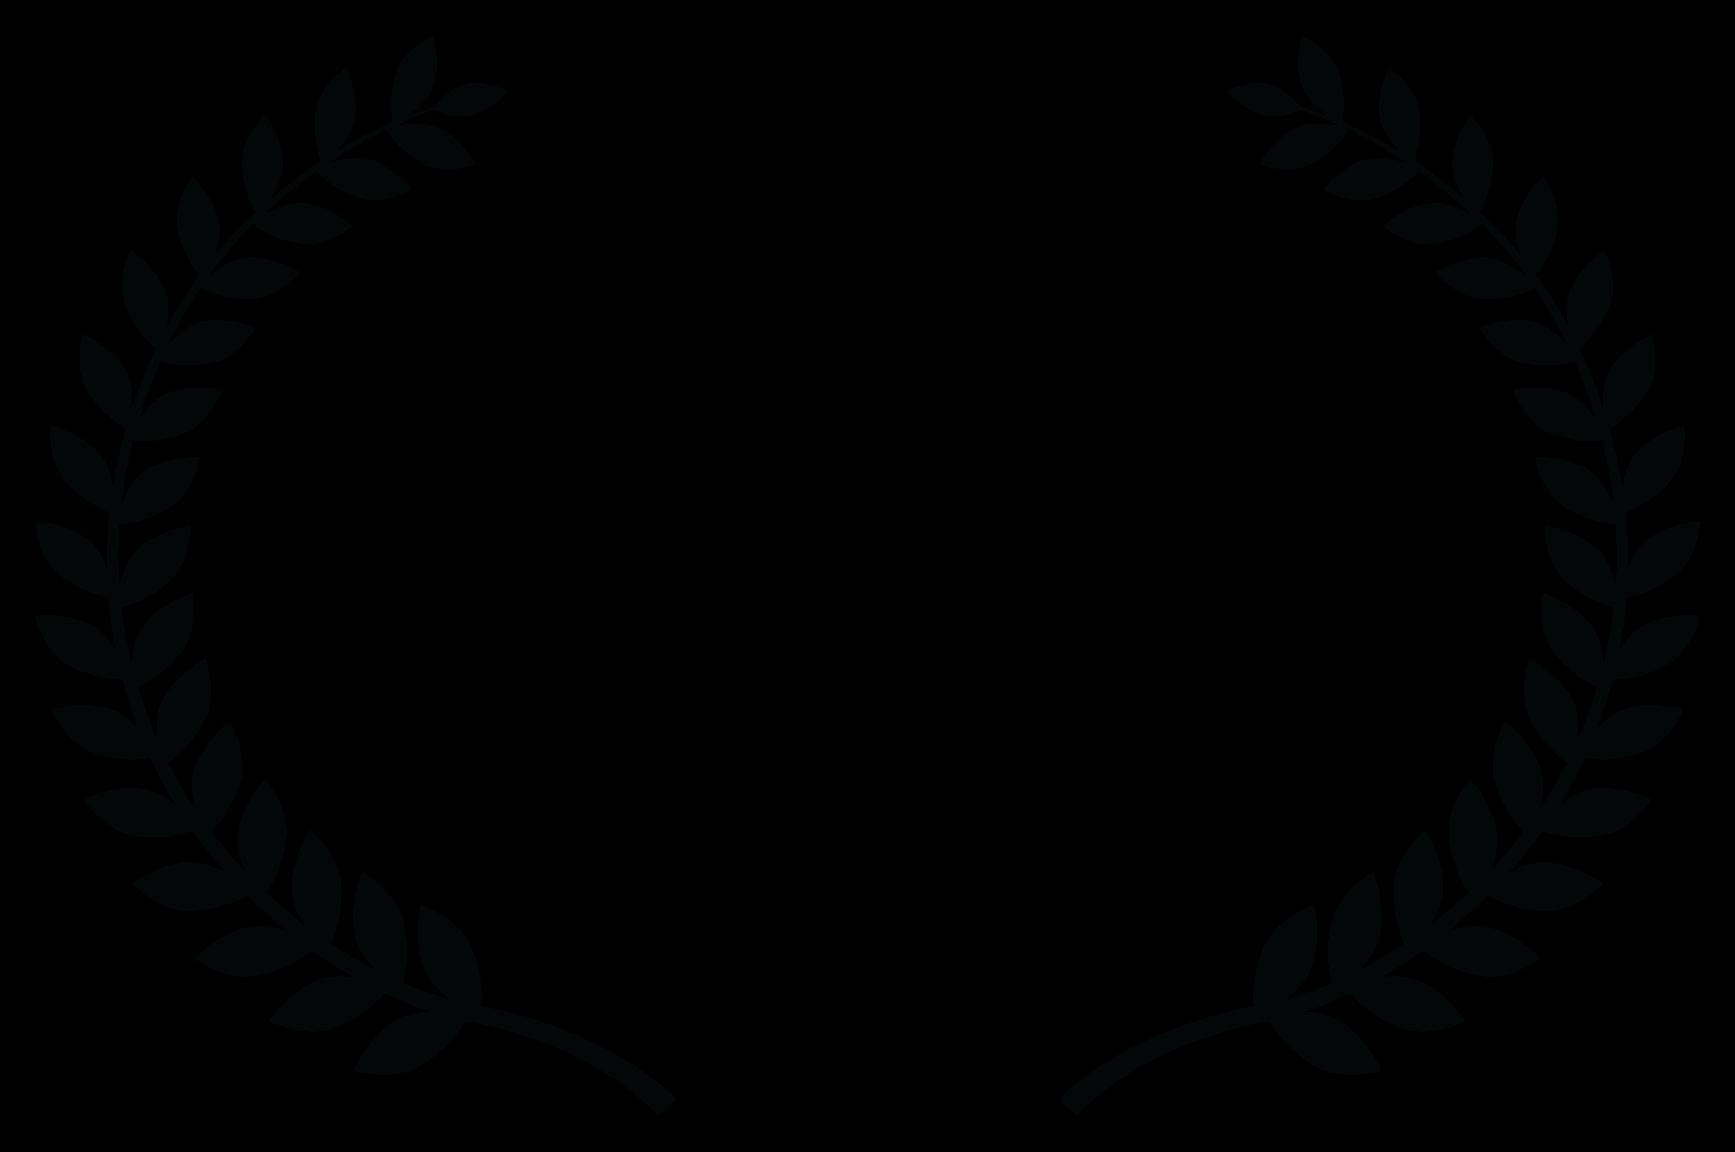 OFFICIAL SELECTION - Experimental Dance Music Film Festival - 2018